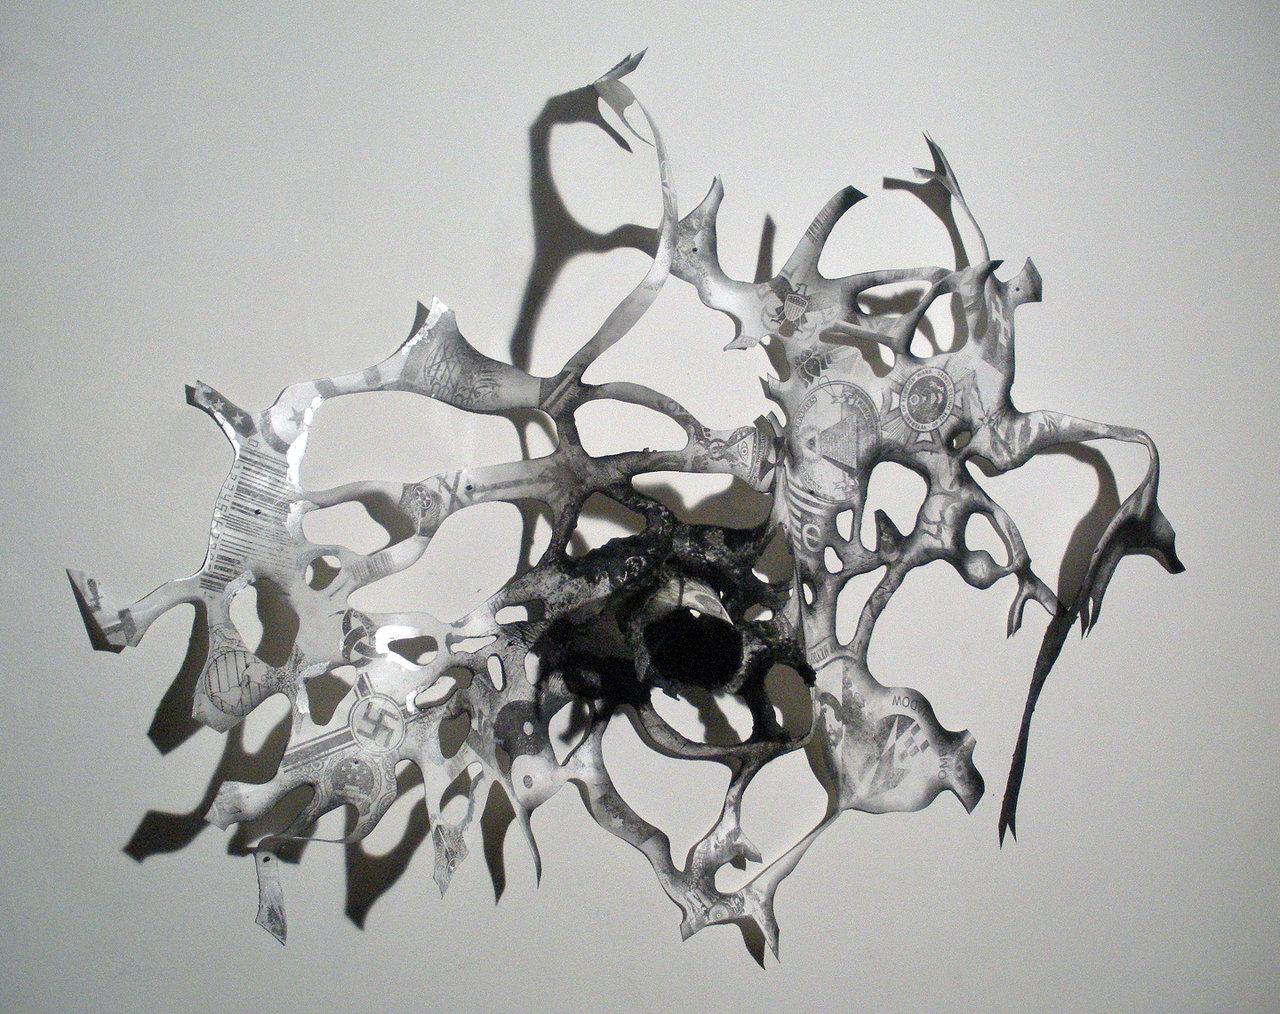 Carol+Ware+-+Tree+of+Knowledge-Stasis+2010+encaustic,+graphite,+transfer,+steel+and+paper+36inx48inx